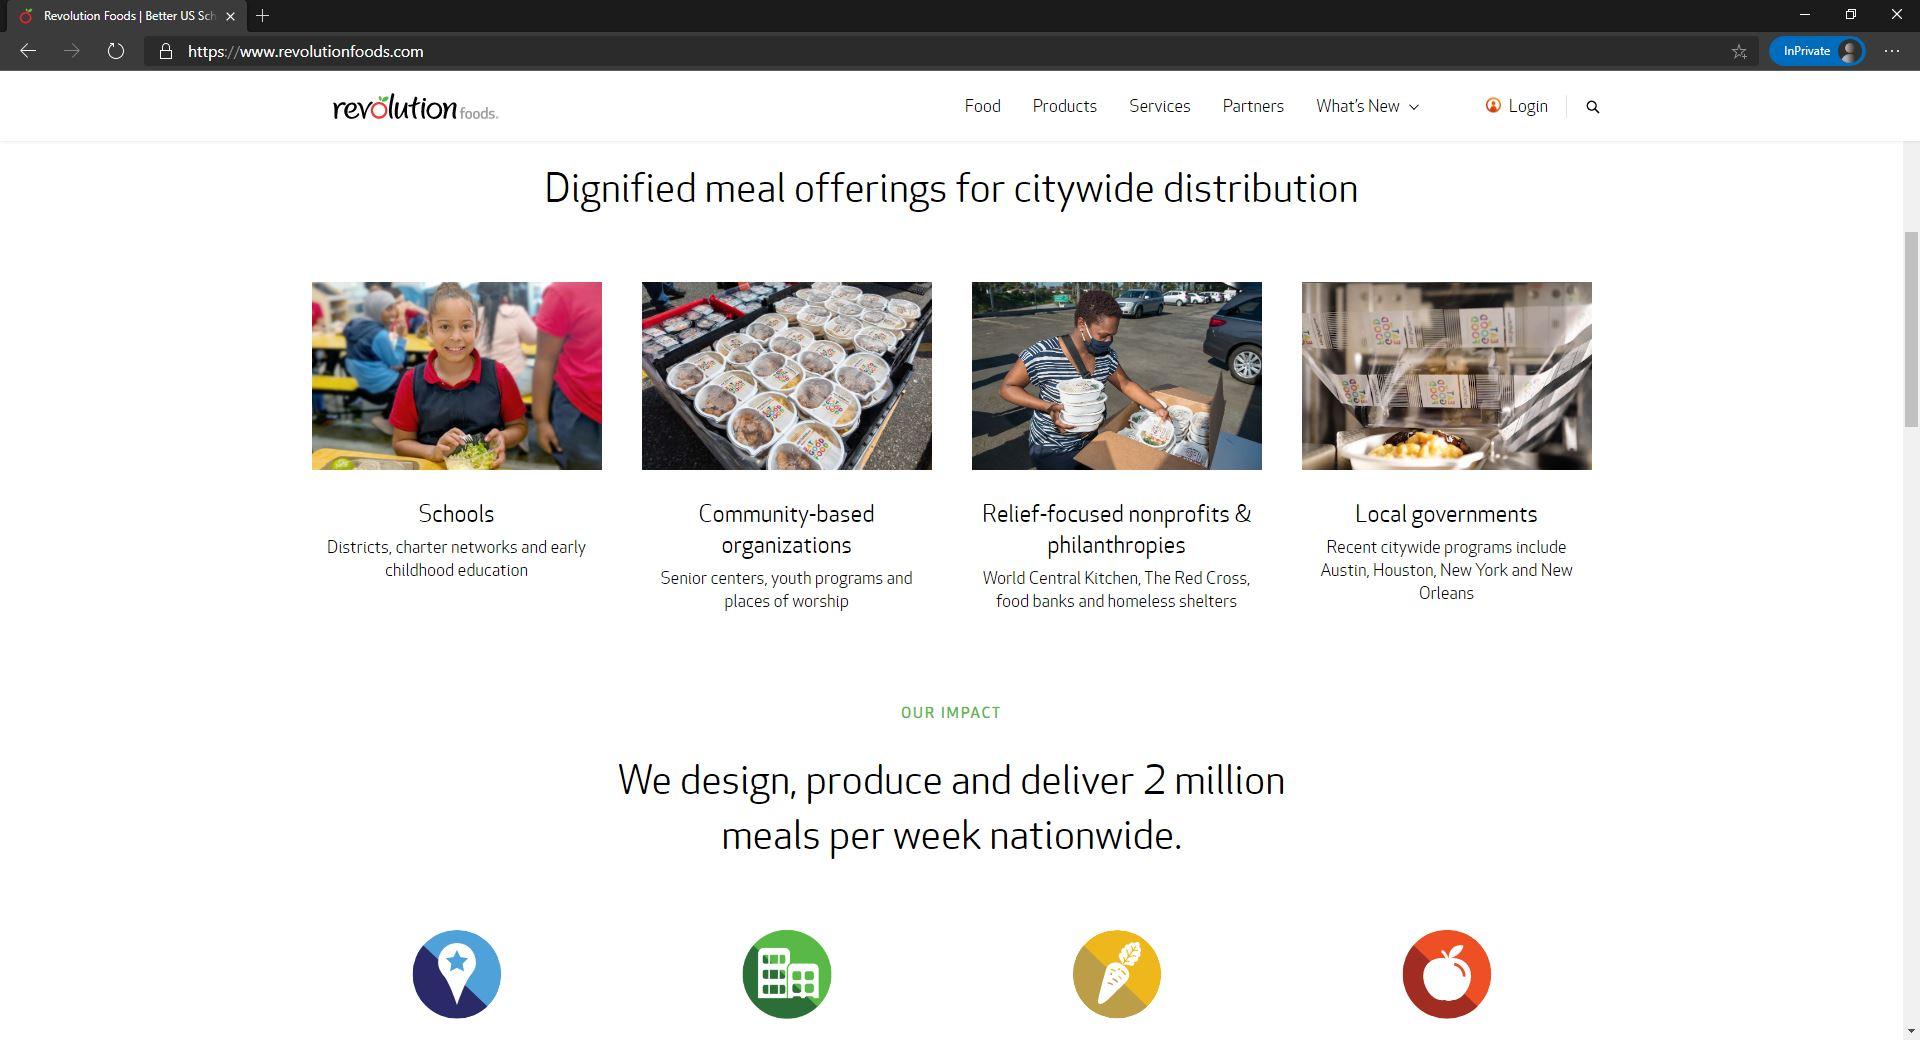 Revolution food website homepage